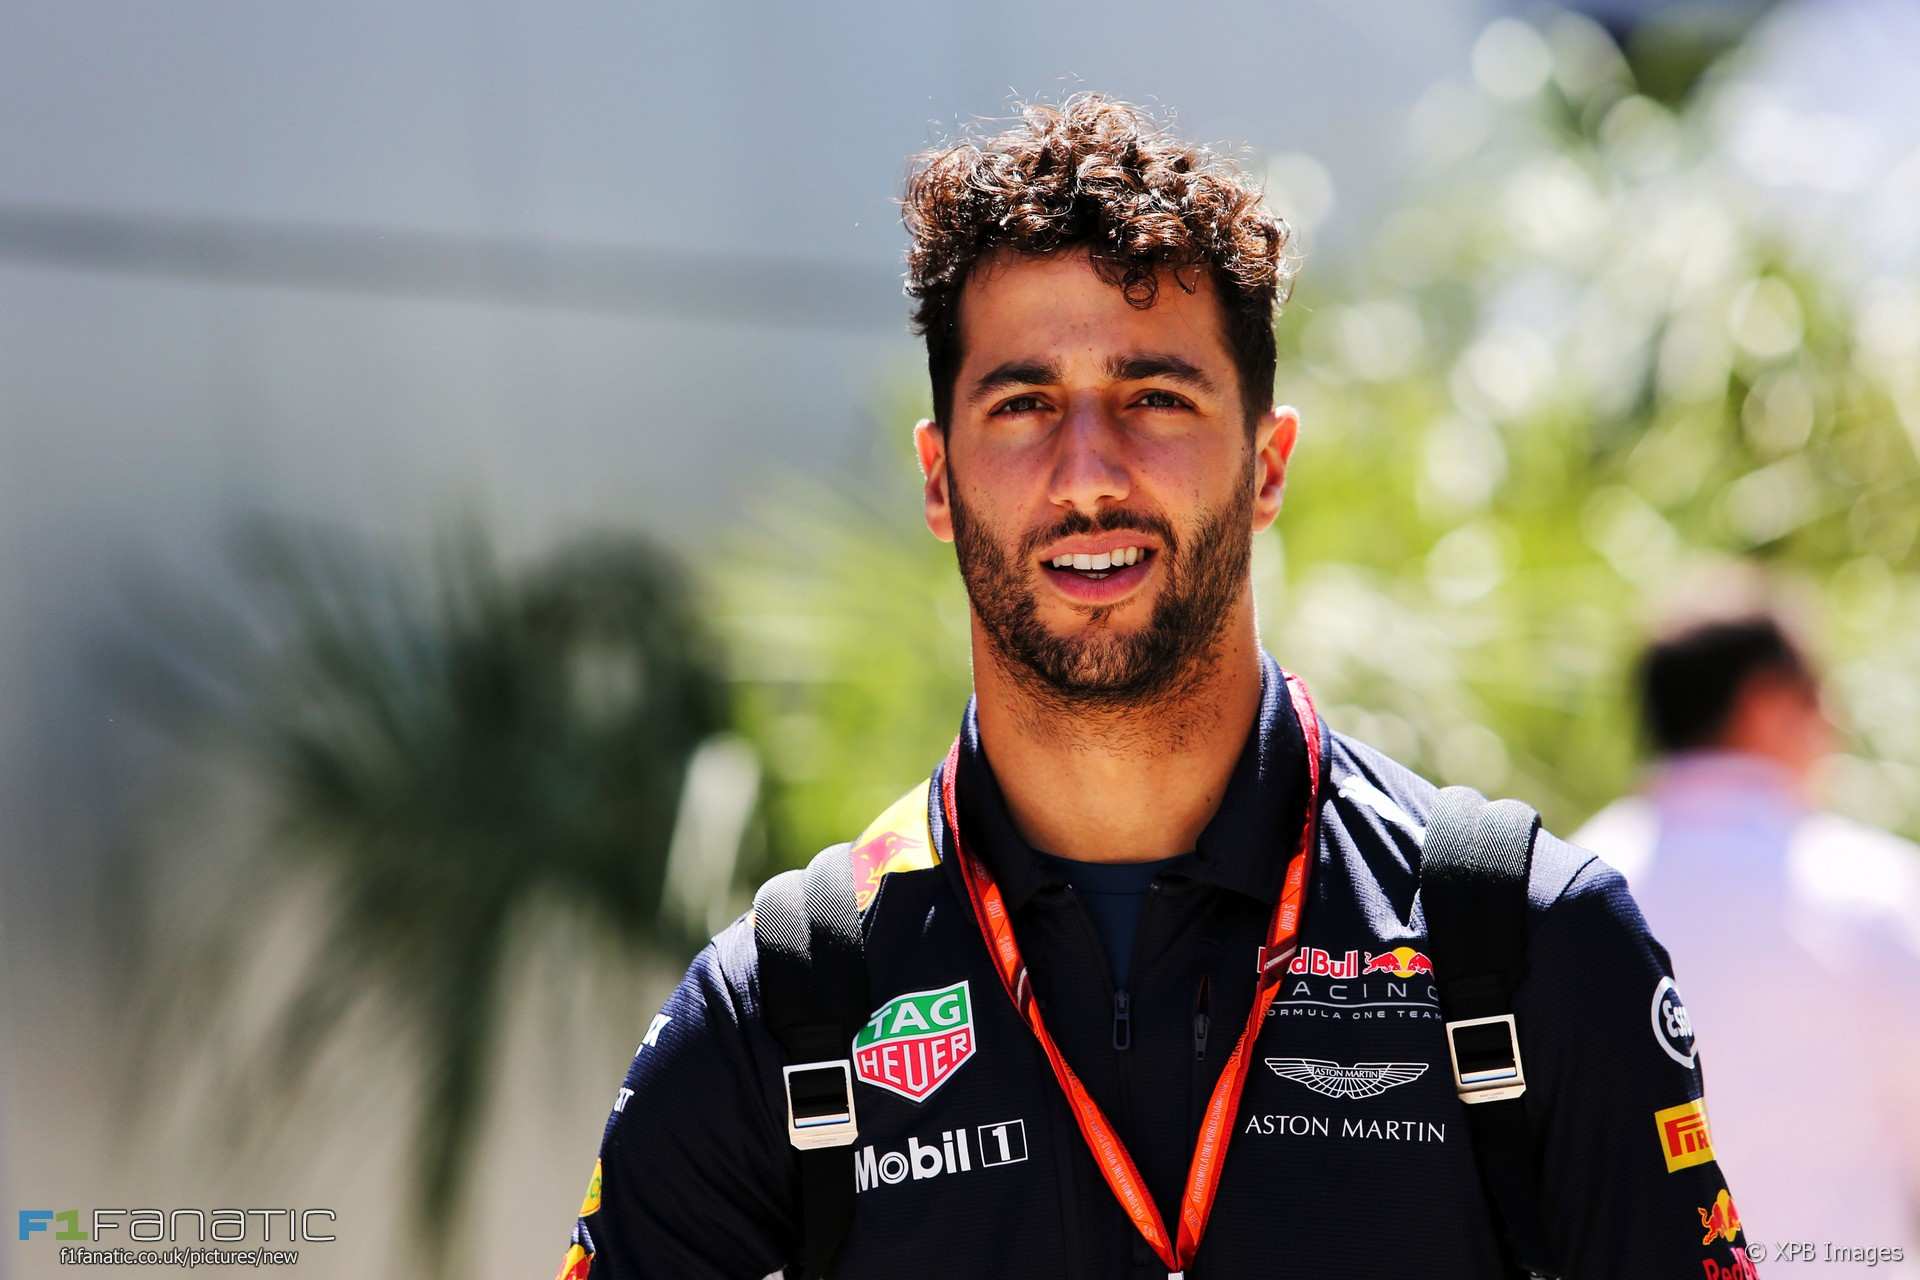 Daniel Ricciardo, Red Bull, Sochi Autodrom, 2017